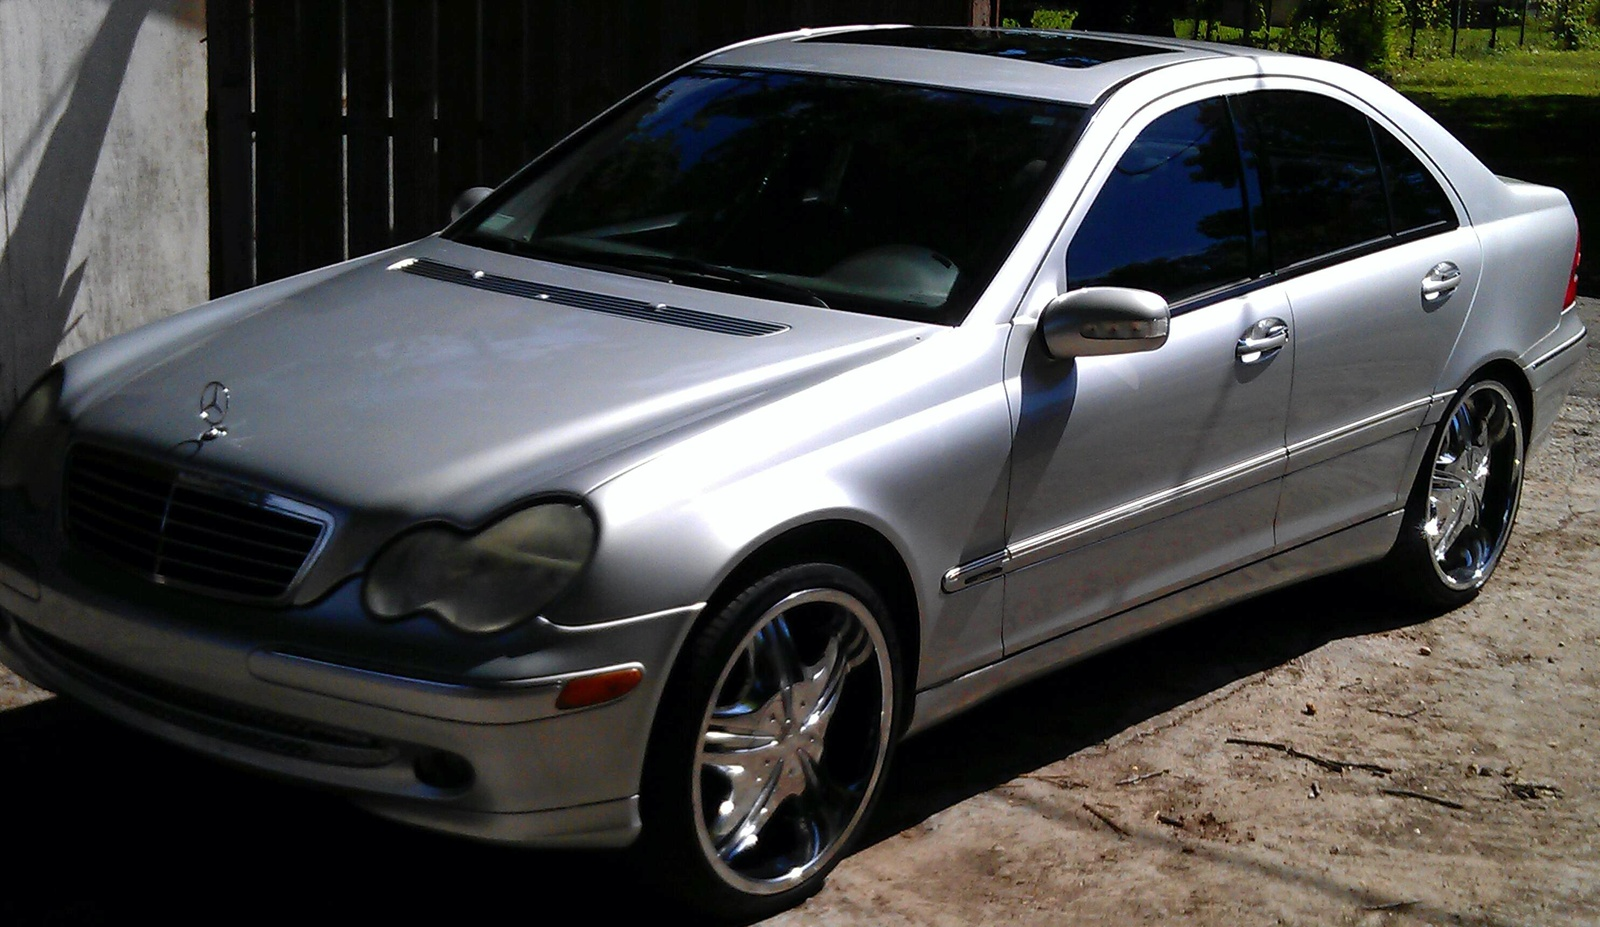 Picture of 2001 mercedes benz c class 4 dr c320 sedan interior for Mercedes benz c class 2001